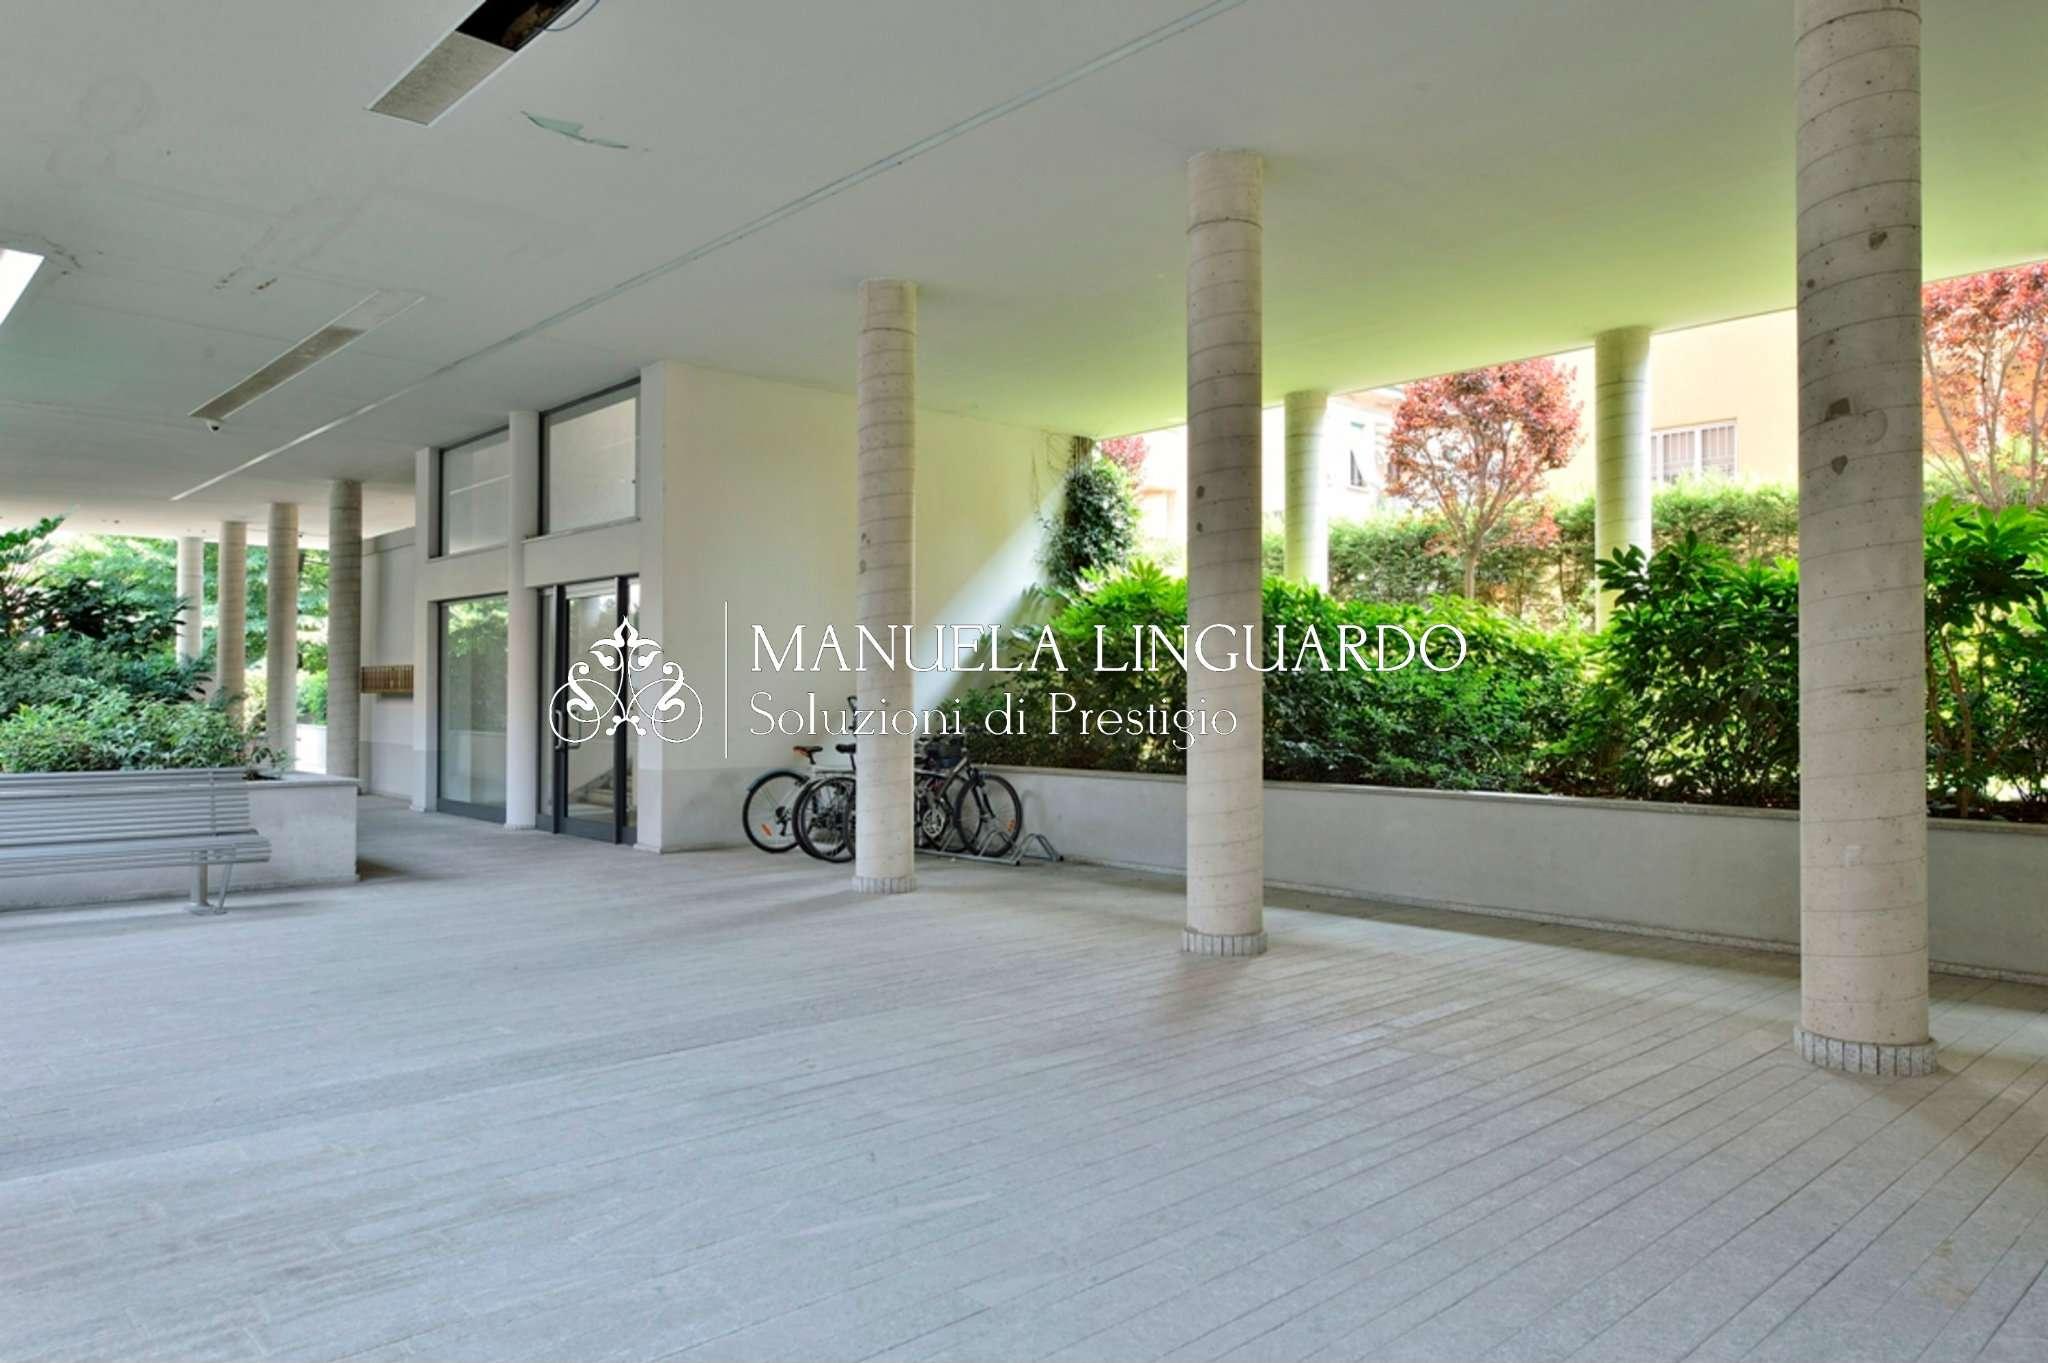 Bilocale in vendita a Milano Lotto, Novara, San Siro - Manuela Linguardo